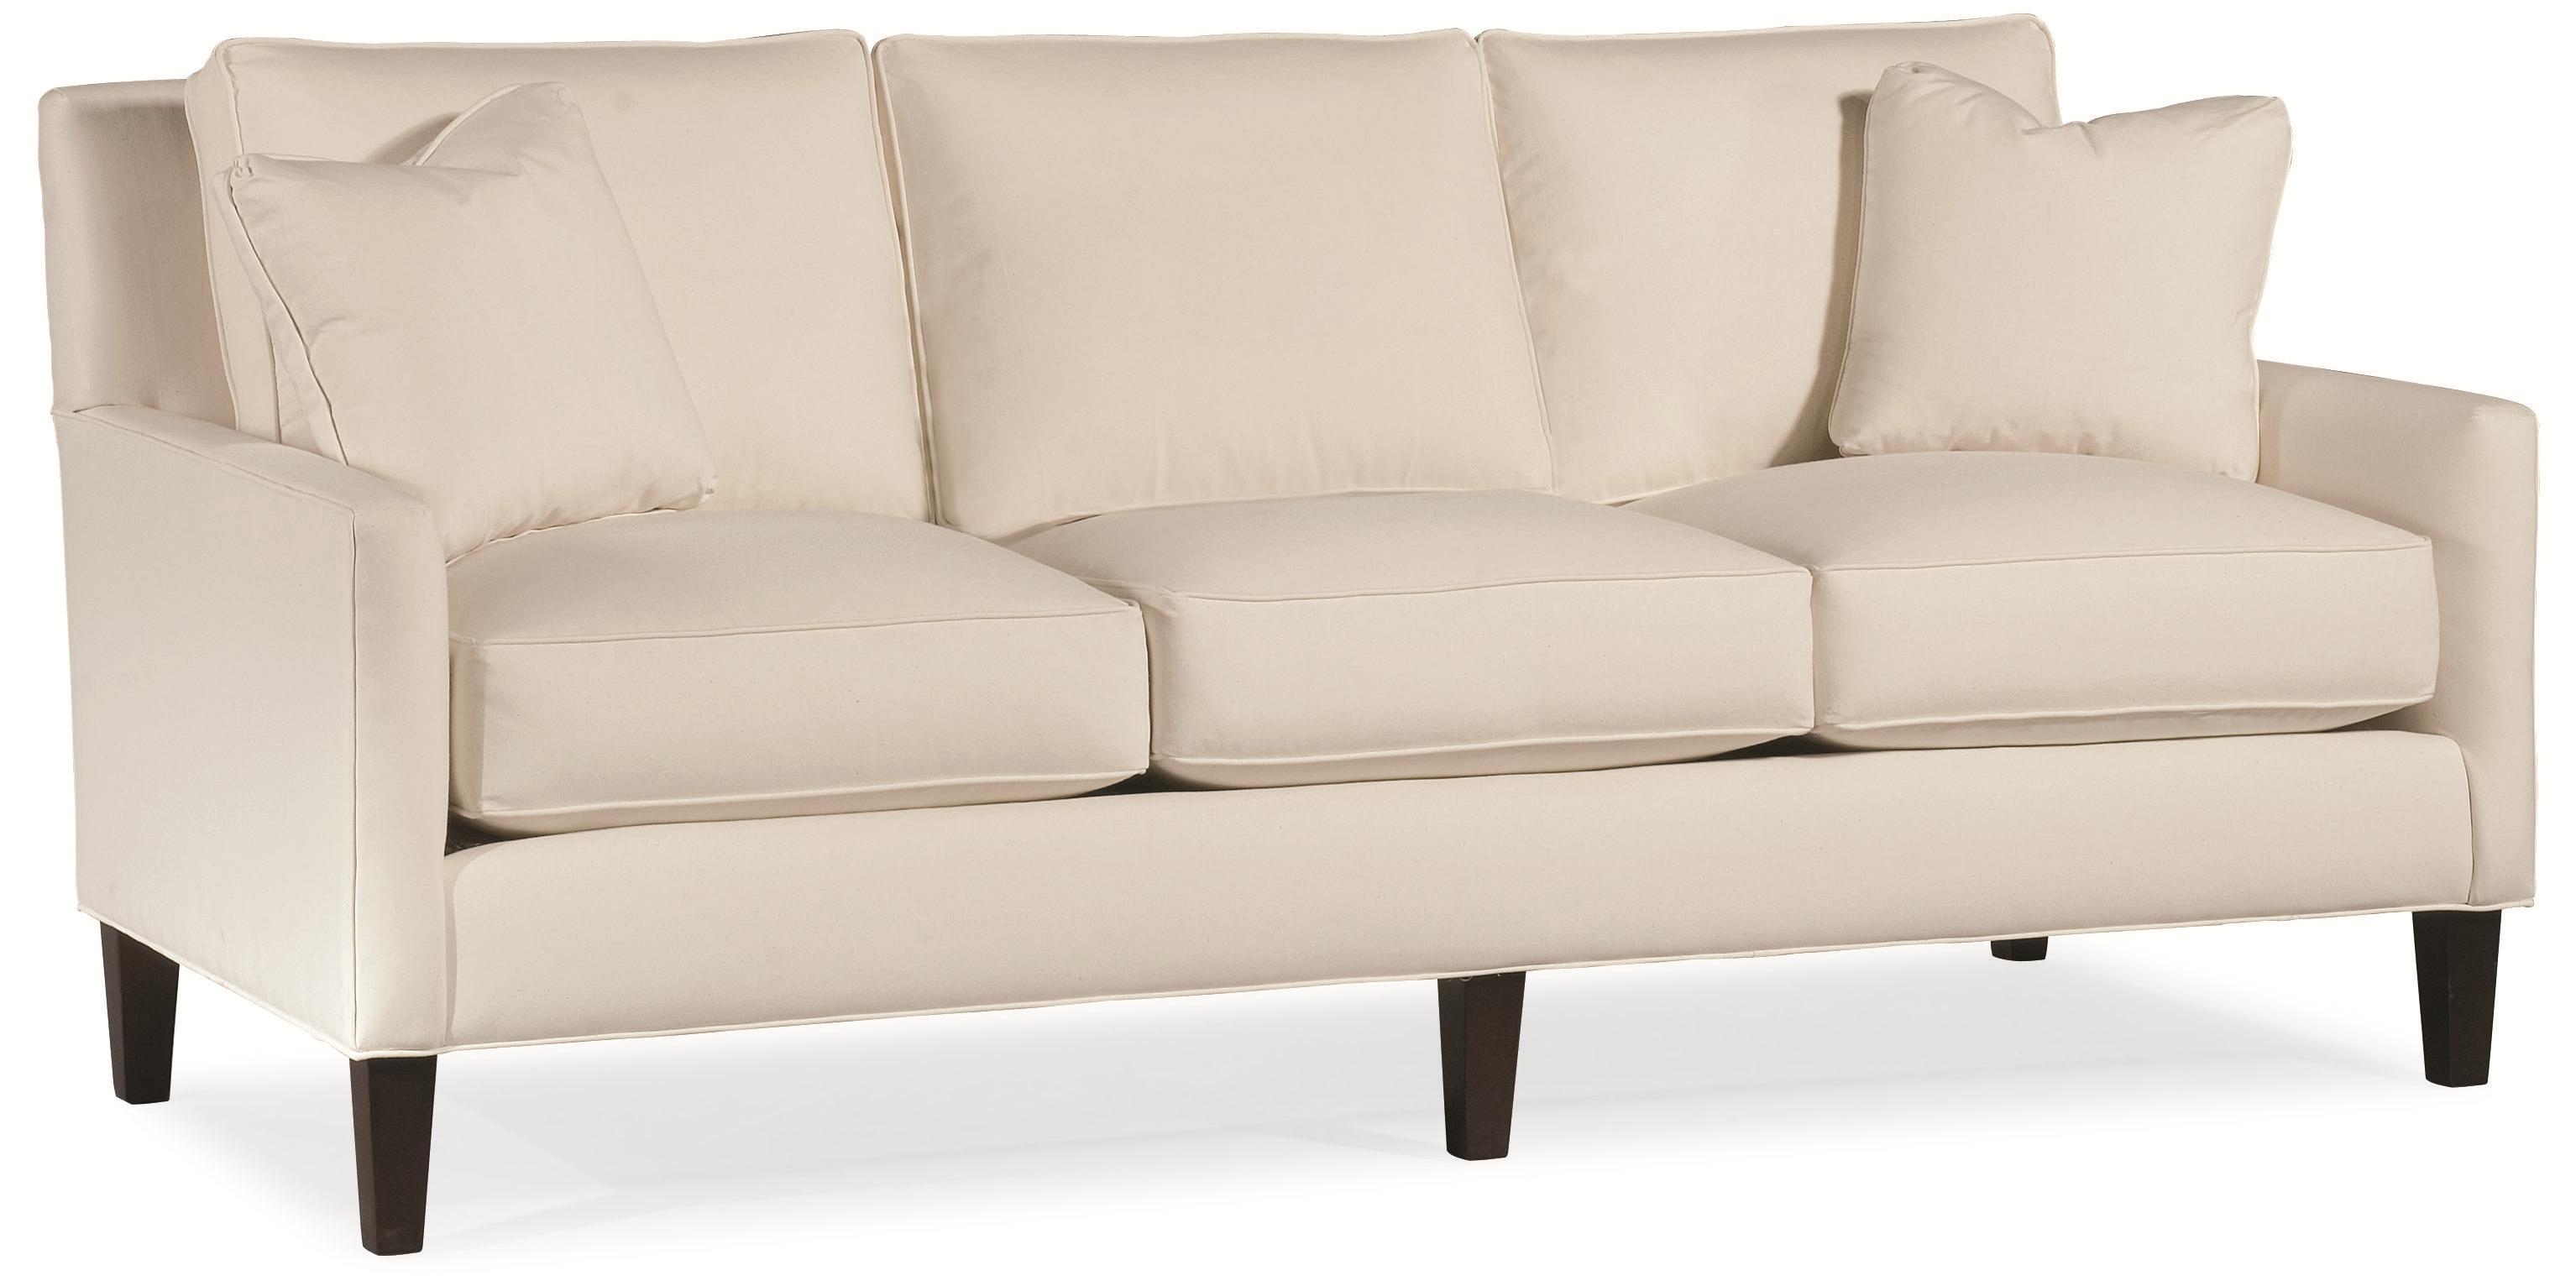 Thomasville® UpholsteryHighlife 3 Seat Sofa ...